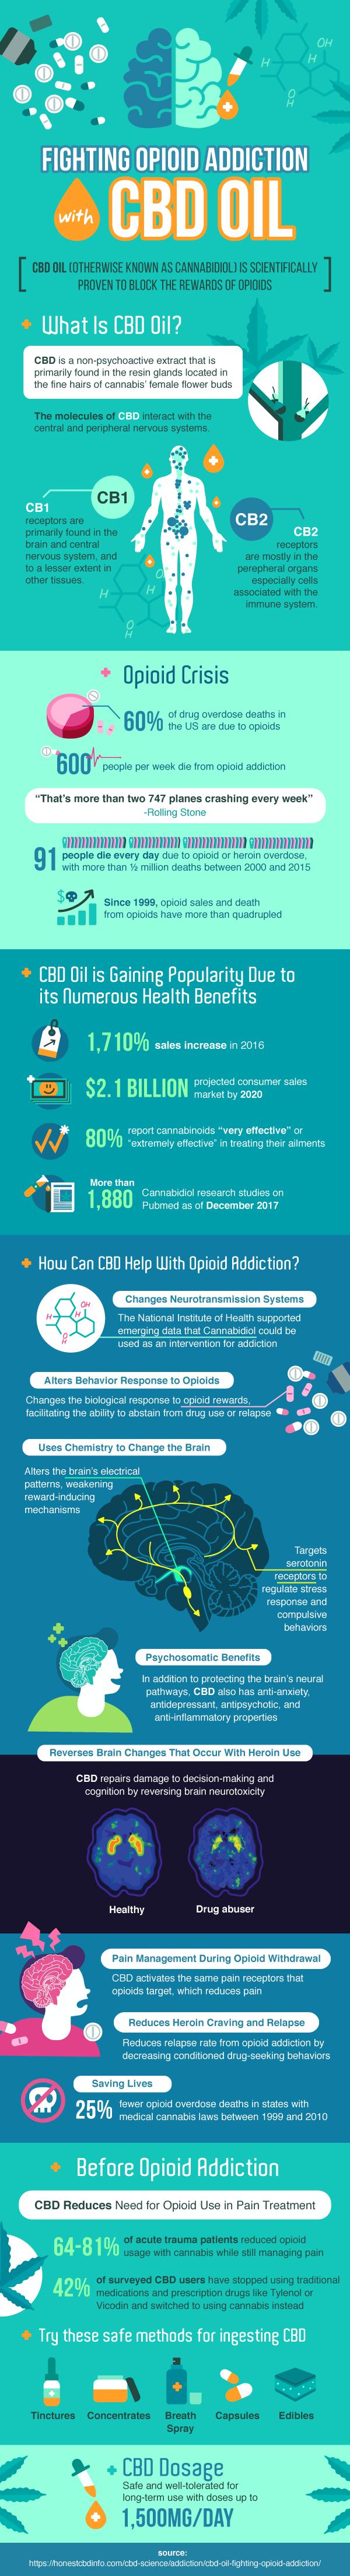 Fighting Opioid Addiction With CBD Oil